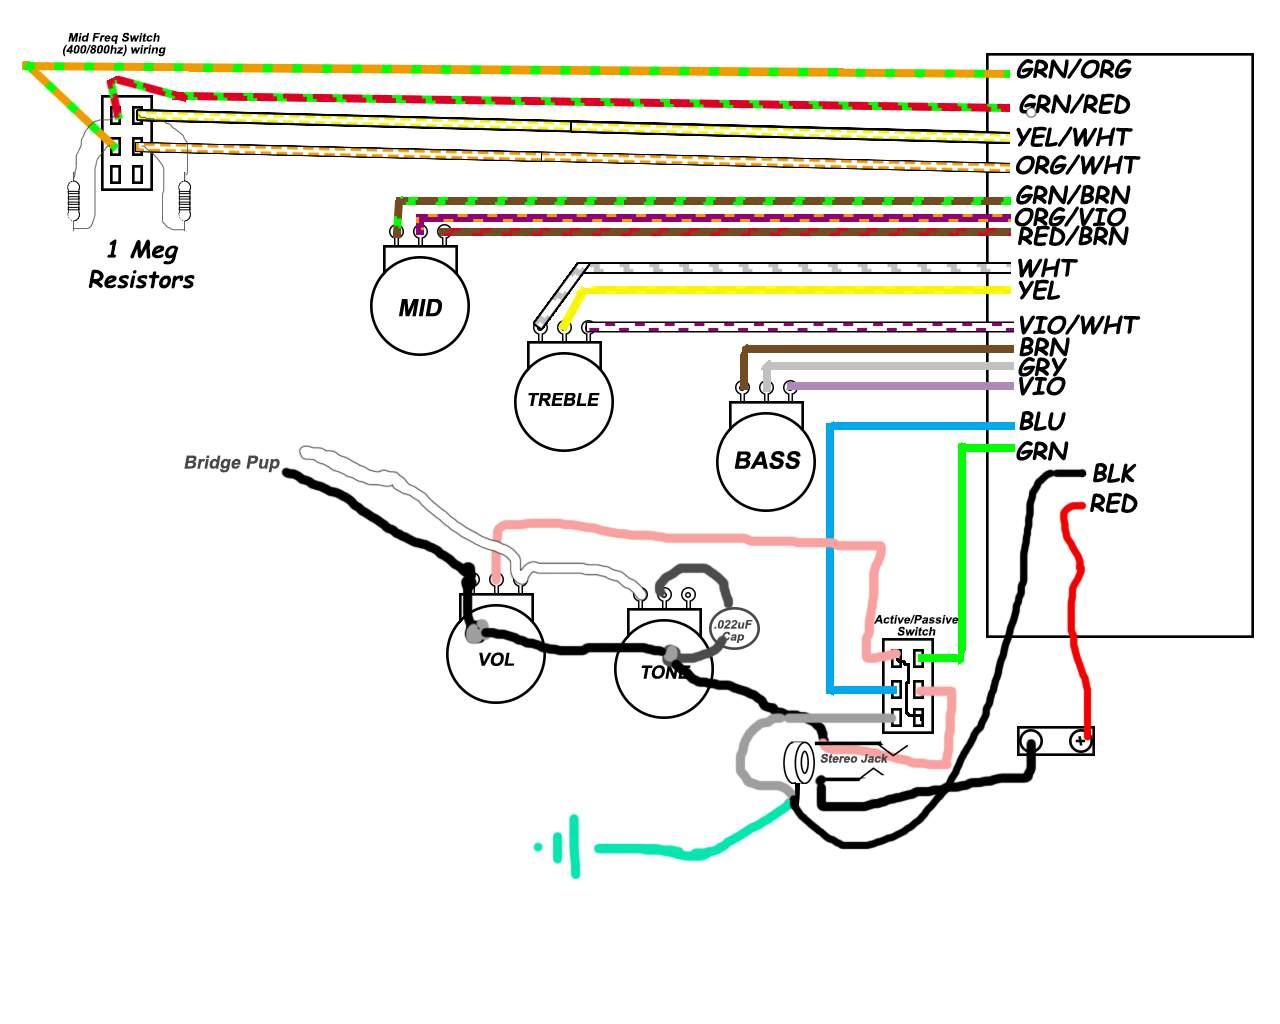 Bluebird Wiring Diagrams Light Automotive Bus Schematics Diagram Online 2002 1988 Tc2000